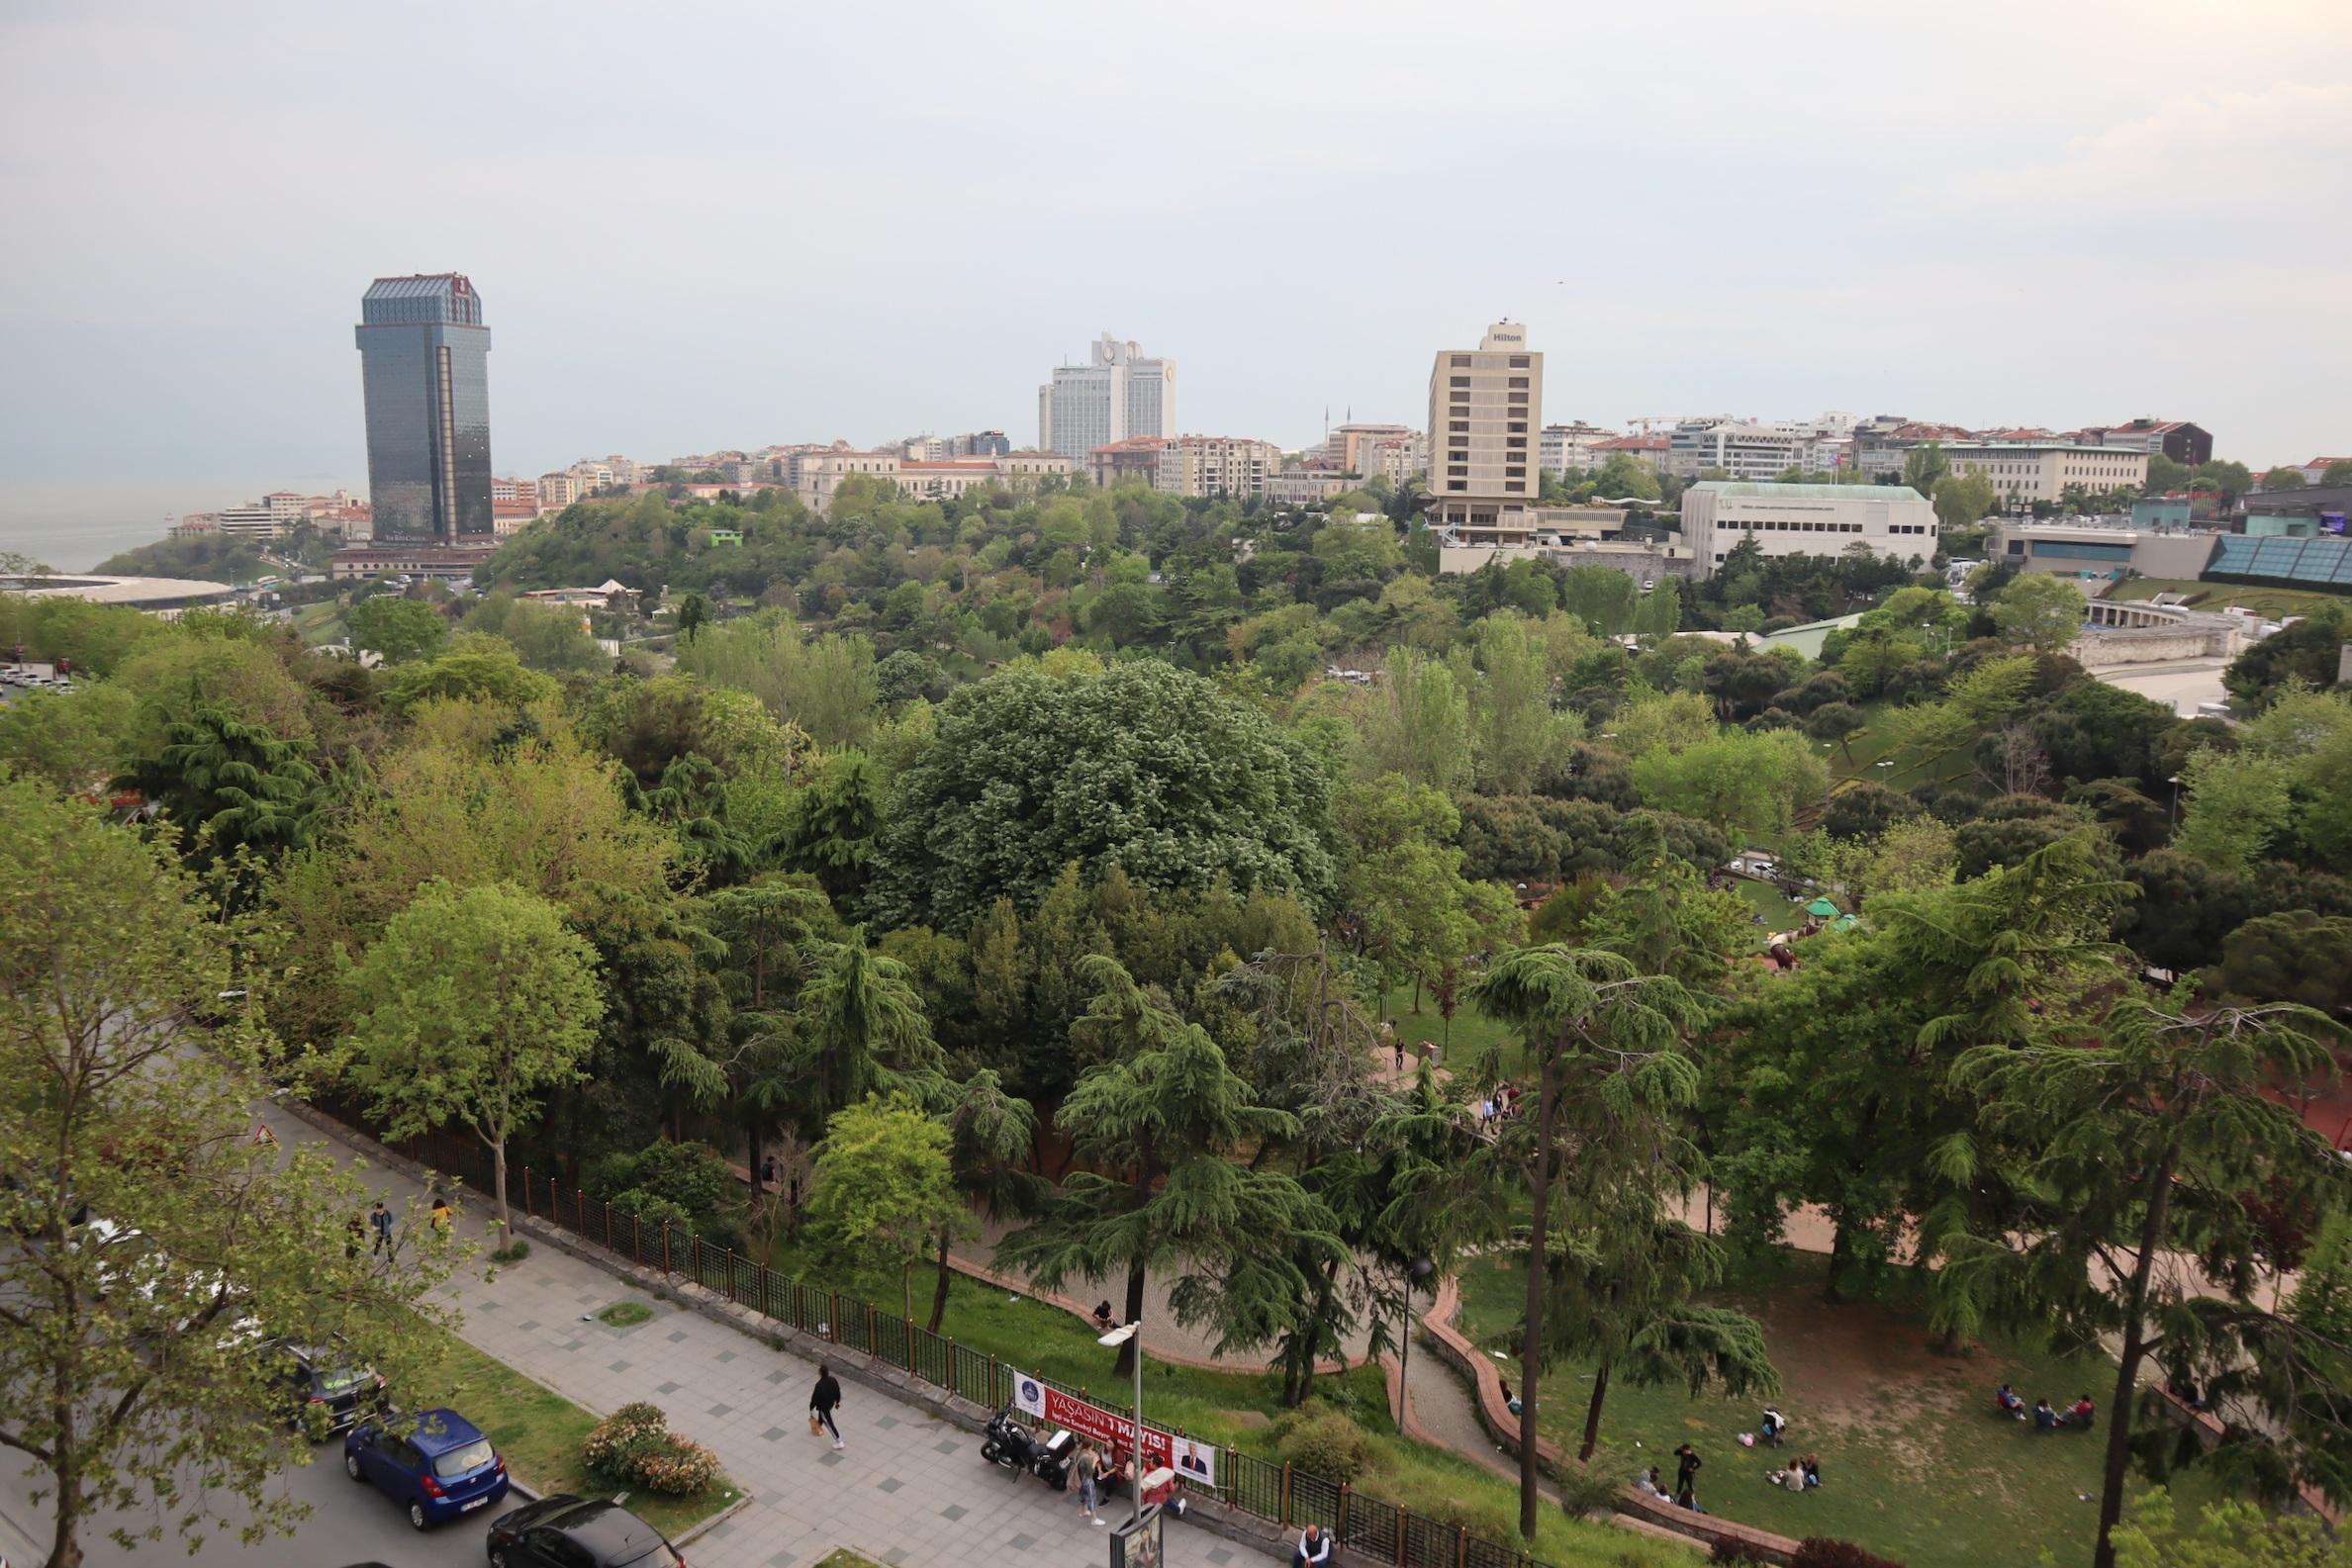 St. Regis Istanbul – Views of Maçka Sanat Park